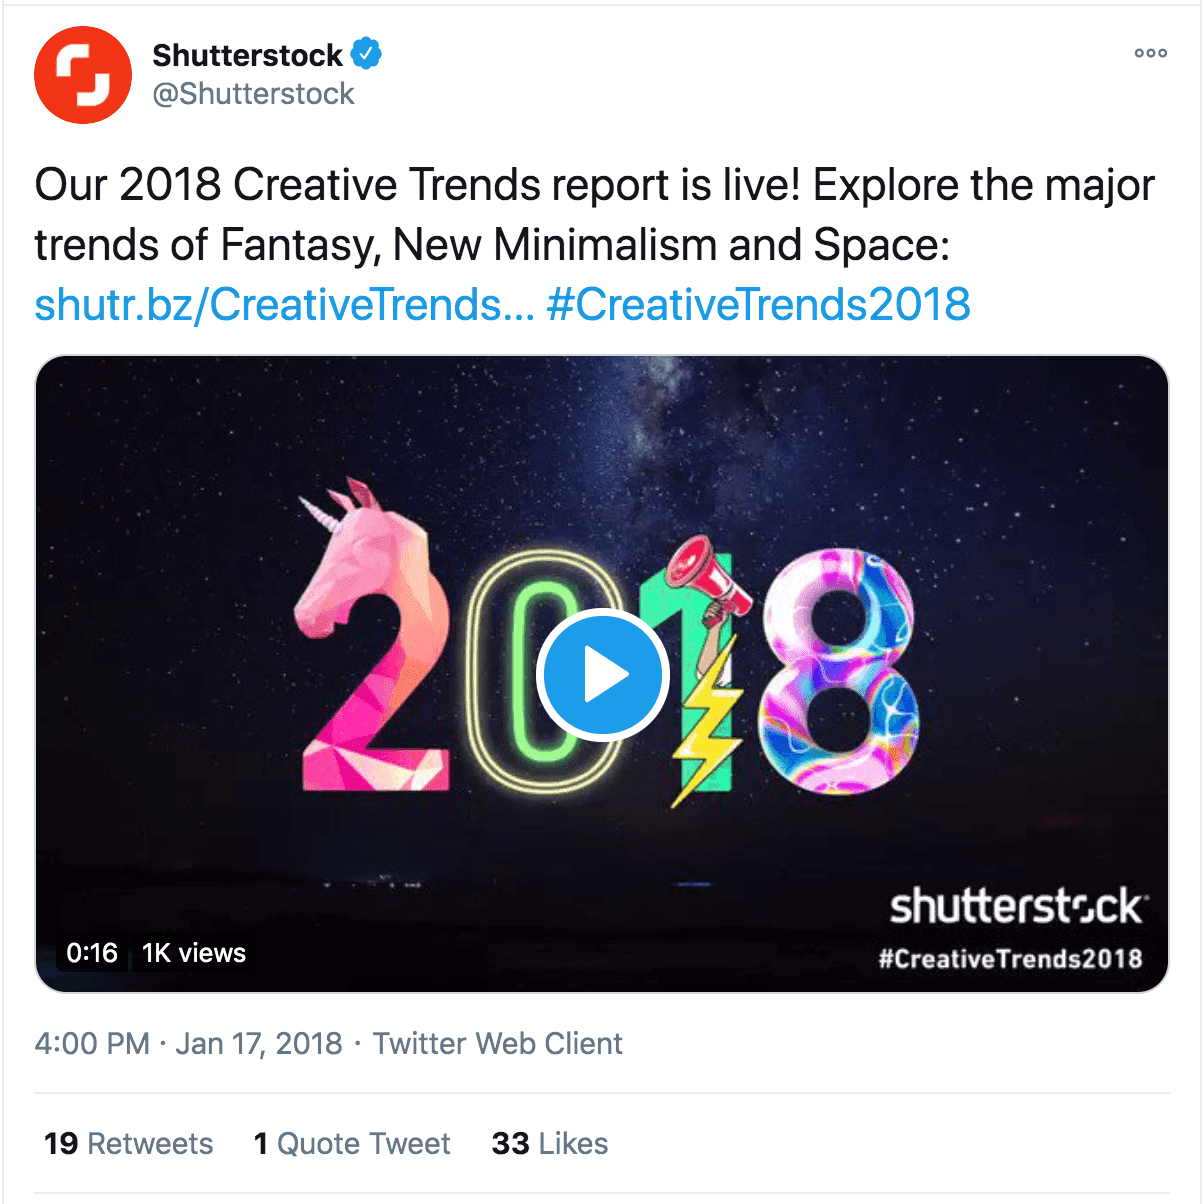 Shutterstock Twitter post